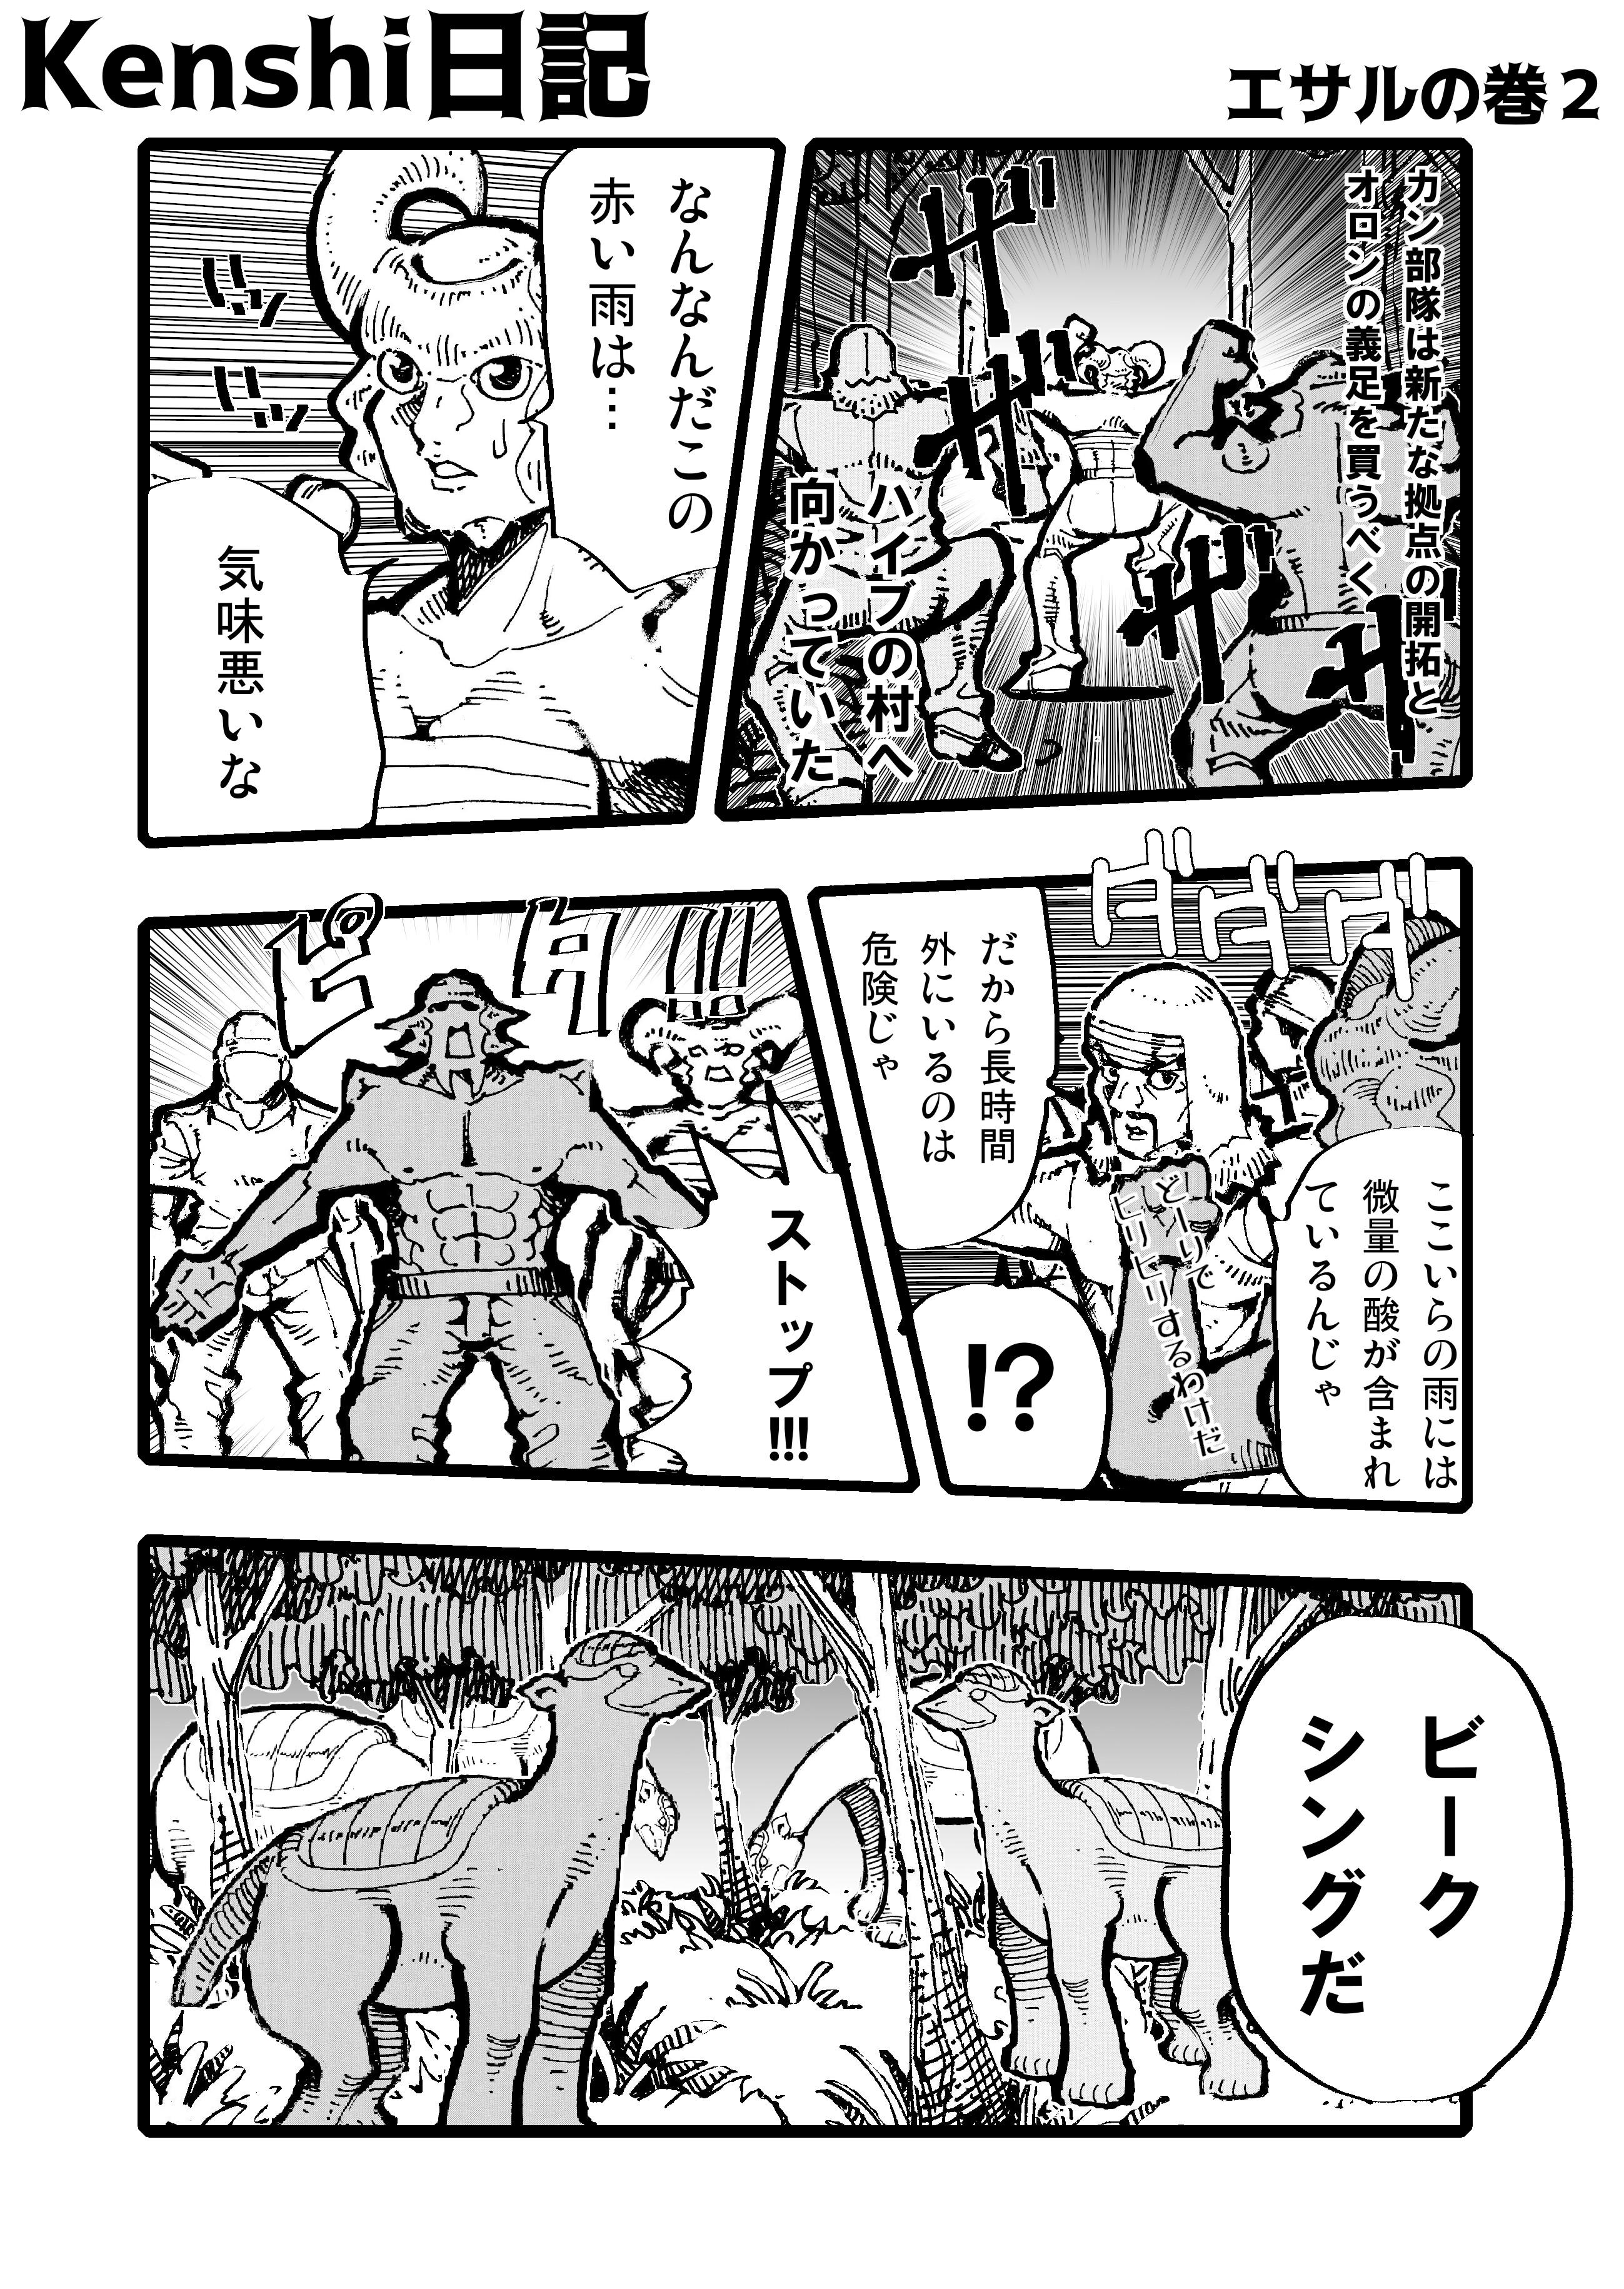 Kenshi日記24 エサルの巻2